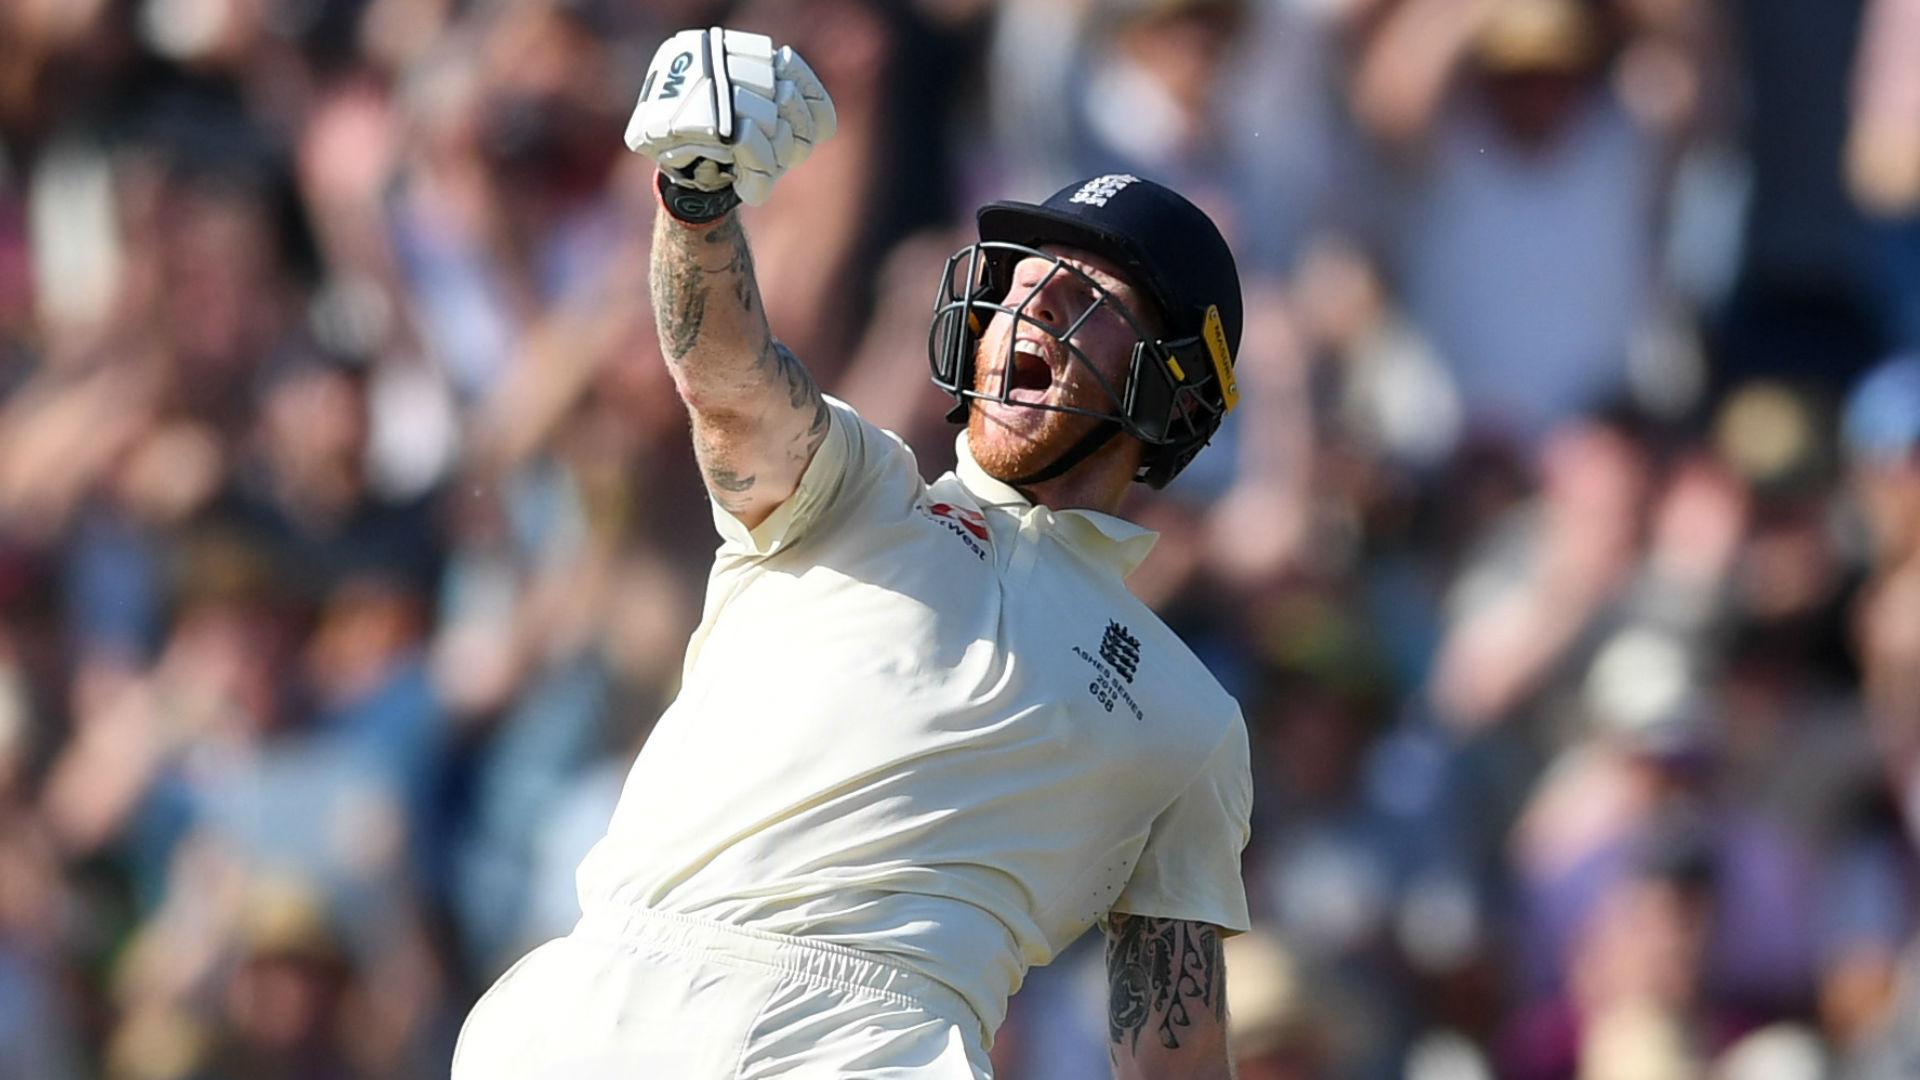 Ashes 2019: England's fourth Test against Australia in Opta